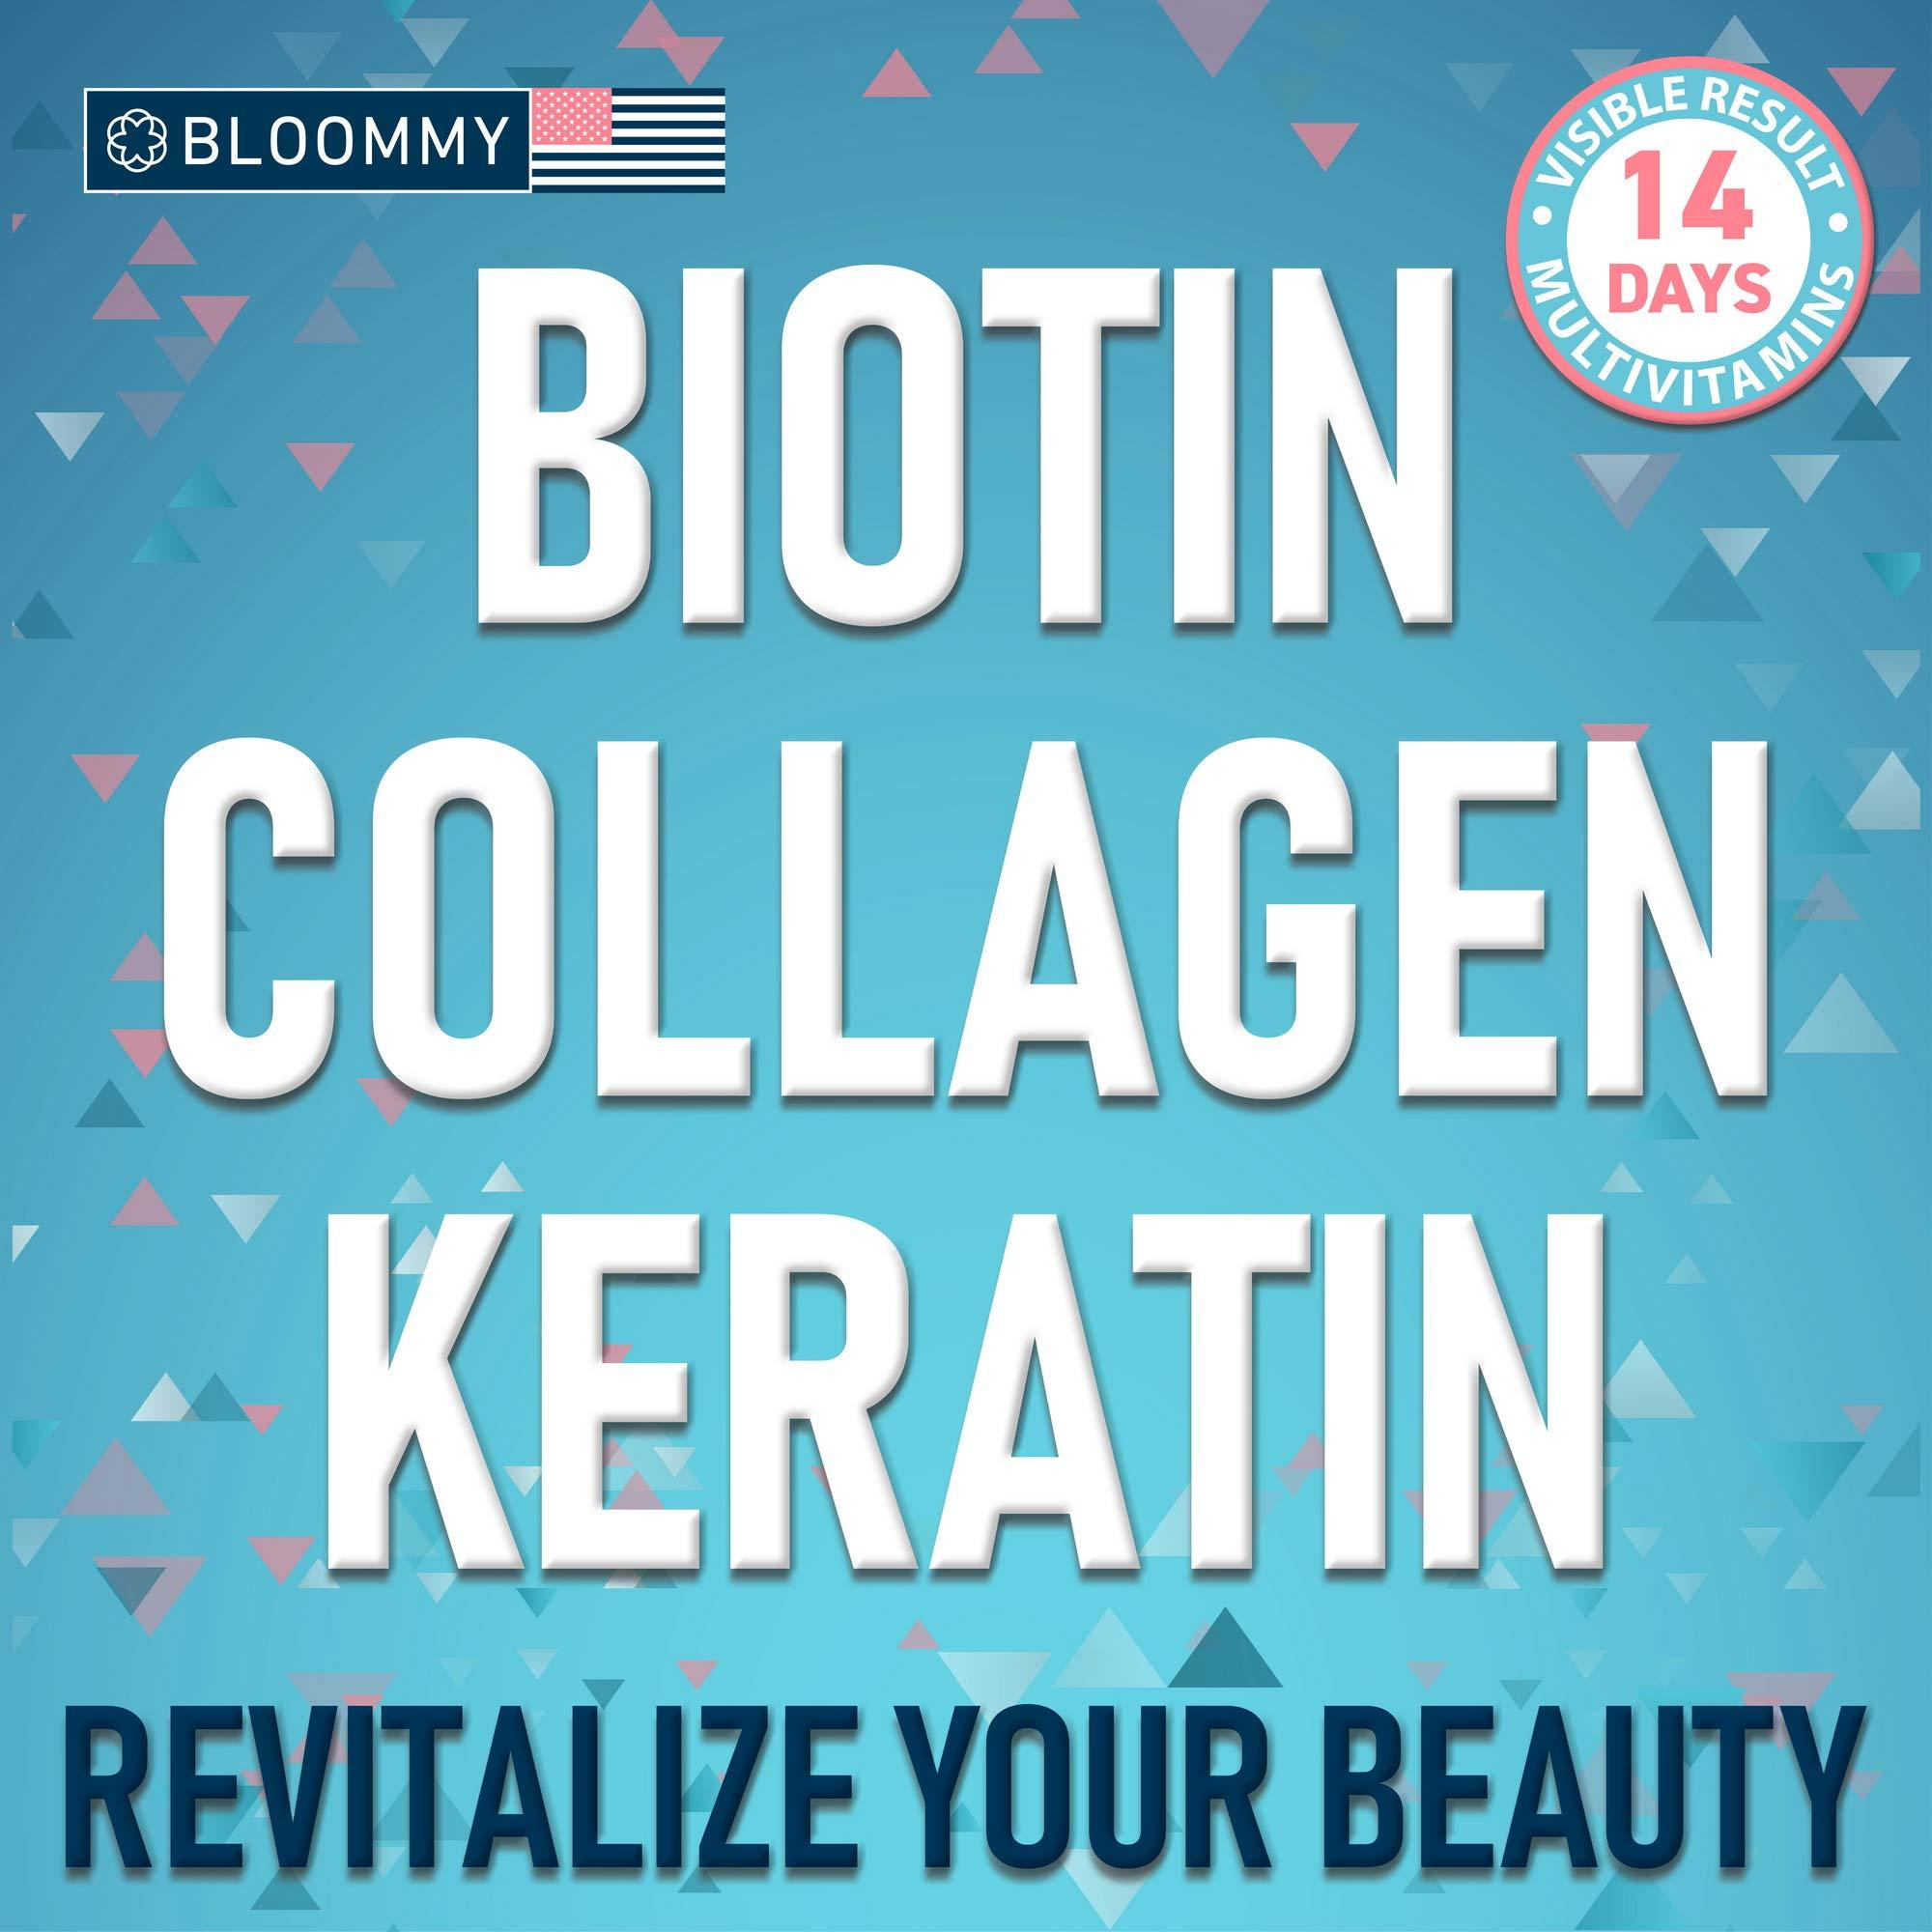 Biotin, Keratin & Collagen Gummies - Made in USA - Extra Strength Biotin 5000 mcg - Healthy Look - Rich in Keratin & Collagen - Premium Treatment - 100% Natural, Tasty & Super Efficient, 60 Count